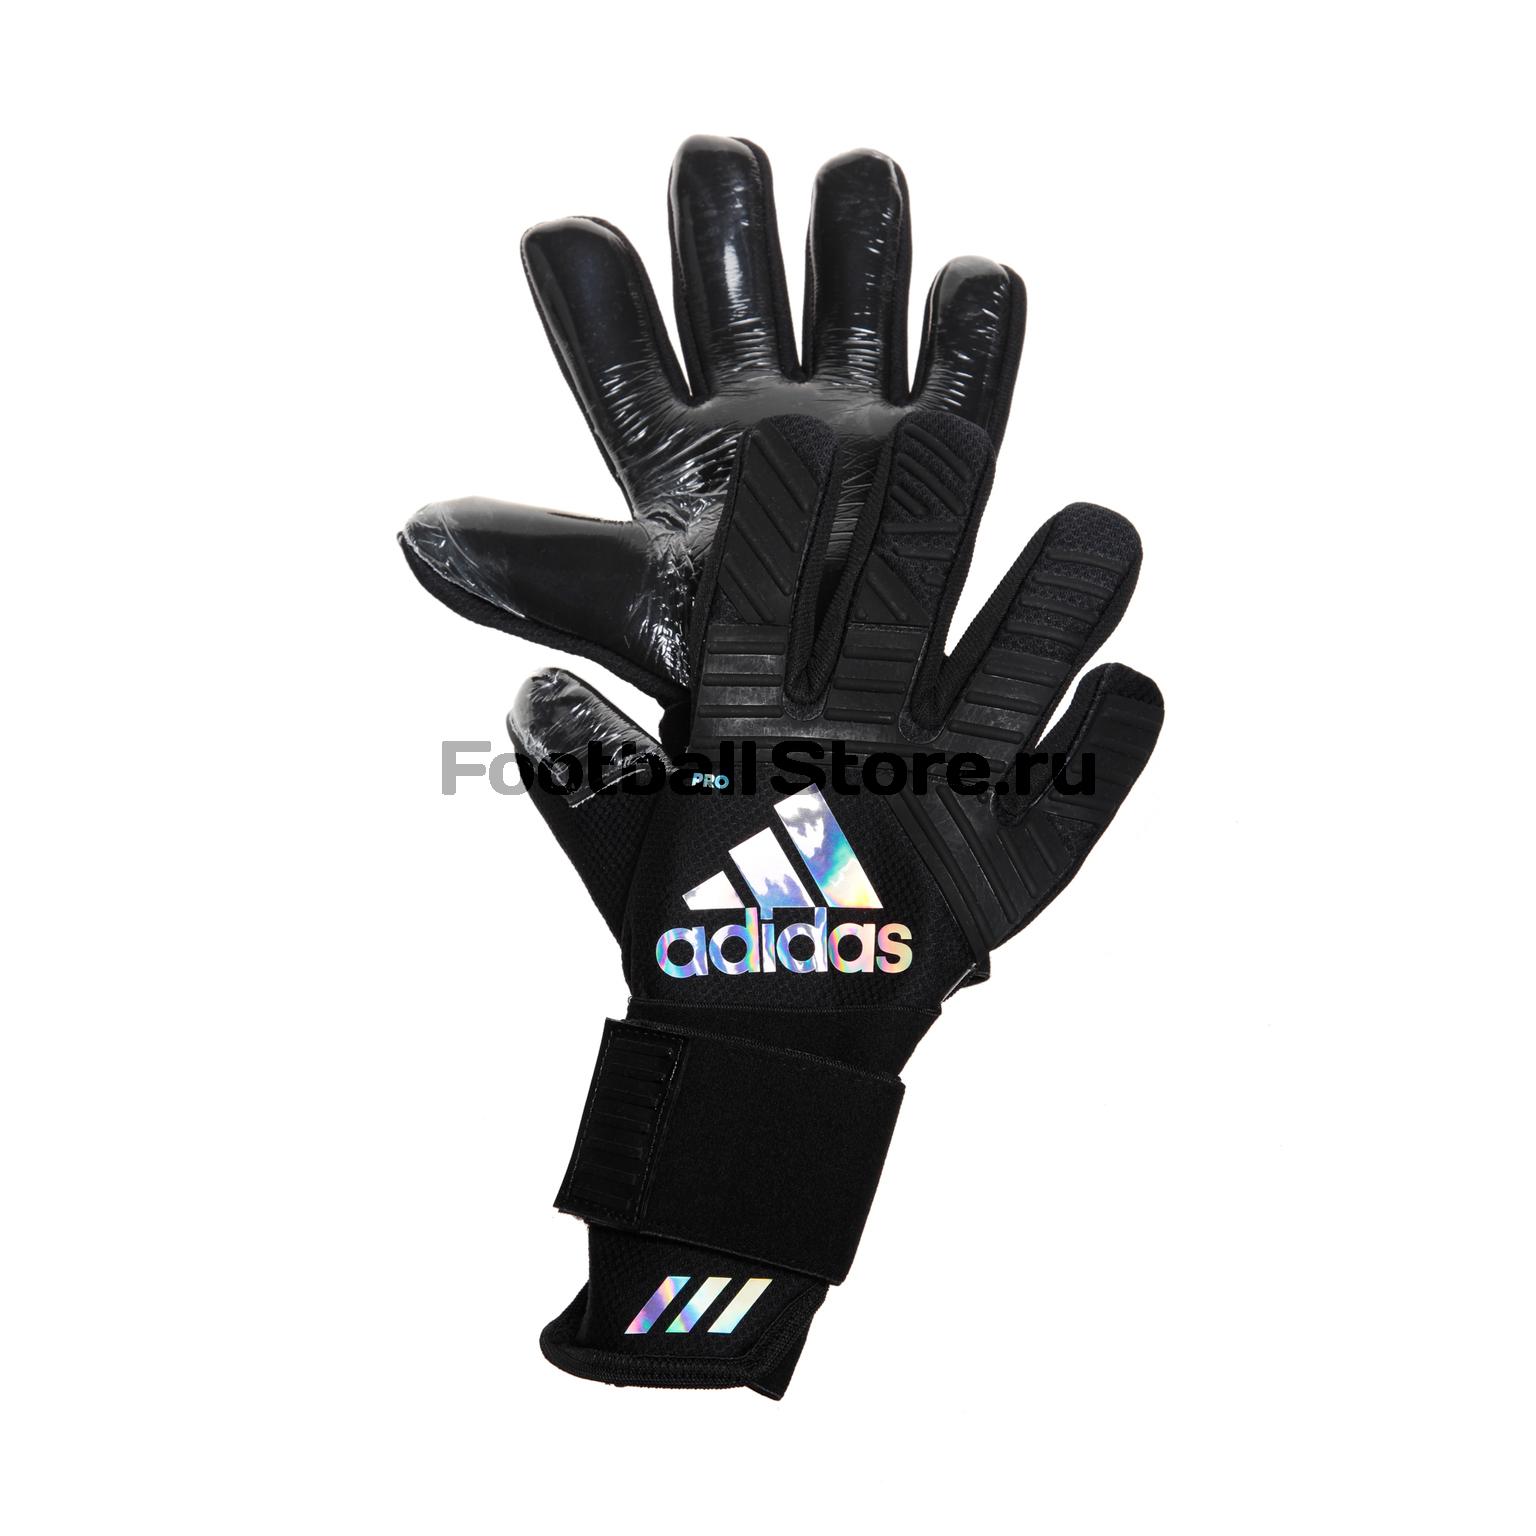 Перчатки вратарские Adidas Ace Magnetic ST CD9131 перчатки adidas перчатки вратарские adidas ace magnetic st cd9131